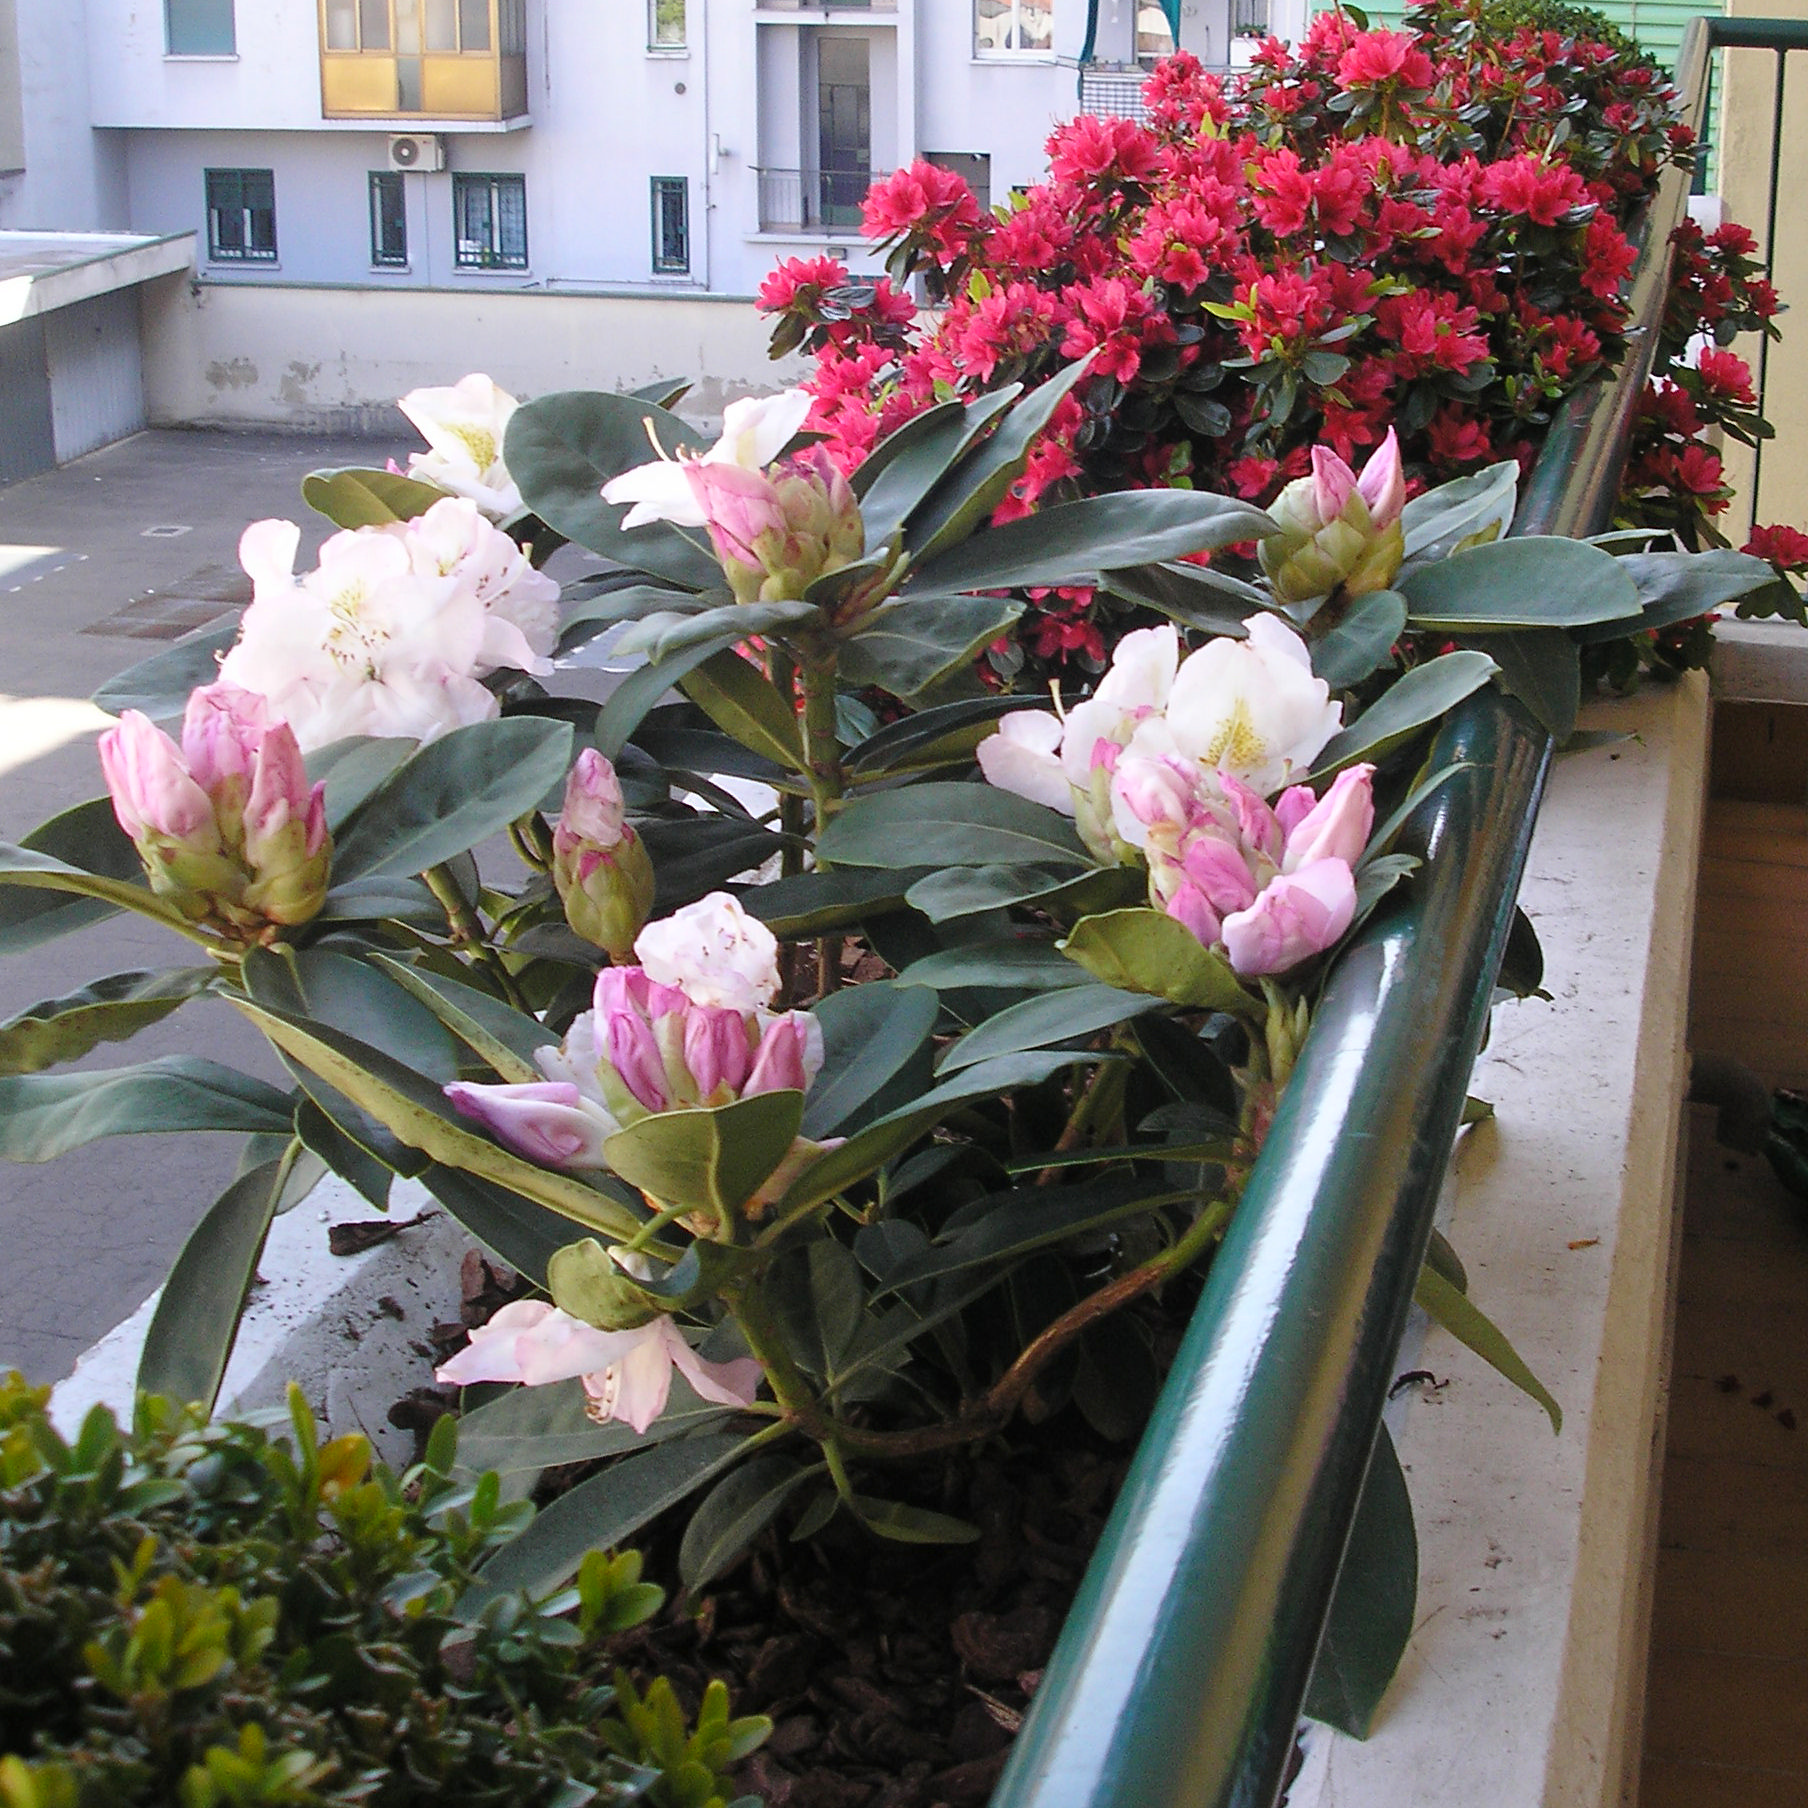 Best terrazzi fioriti progetti contemporary idee - Idee per terrazzi fioriti ...